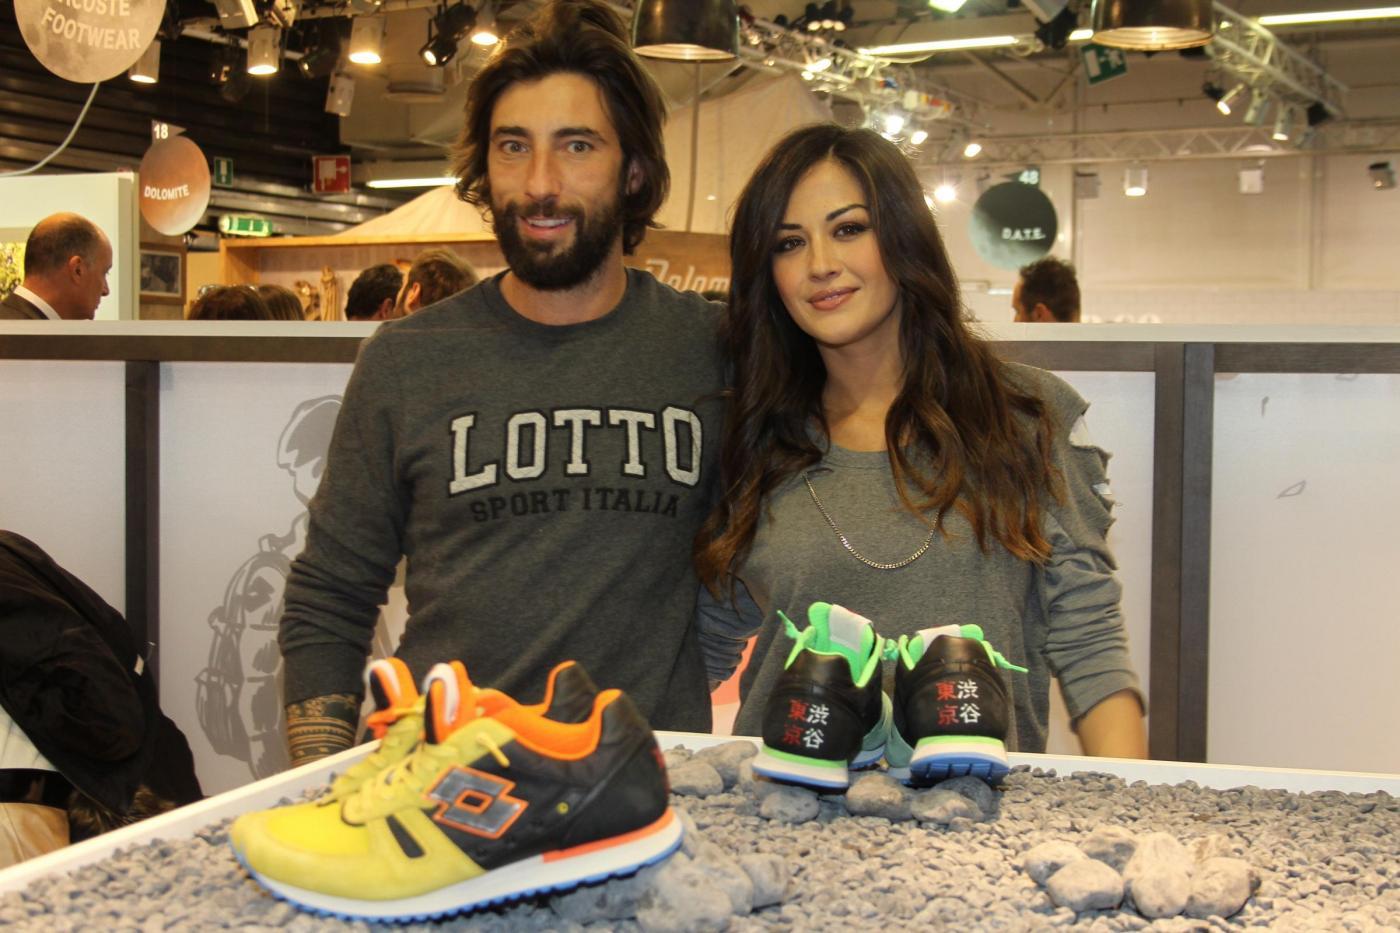 Vittorio Brumotti e Giorgia Palmas si sono lasciati? Meno foto insieme sui social